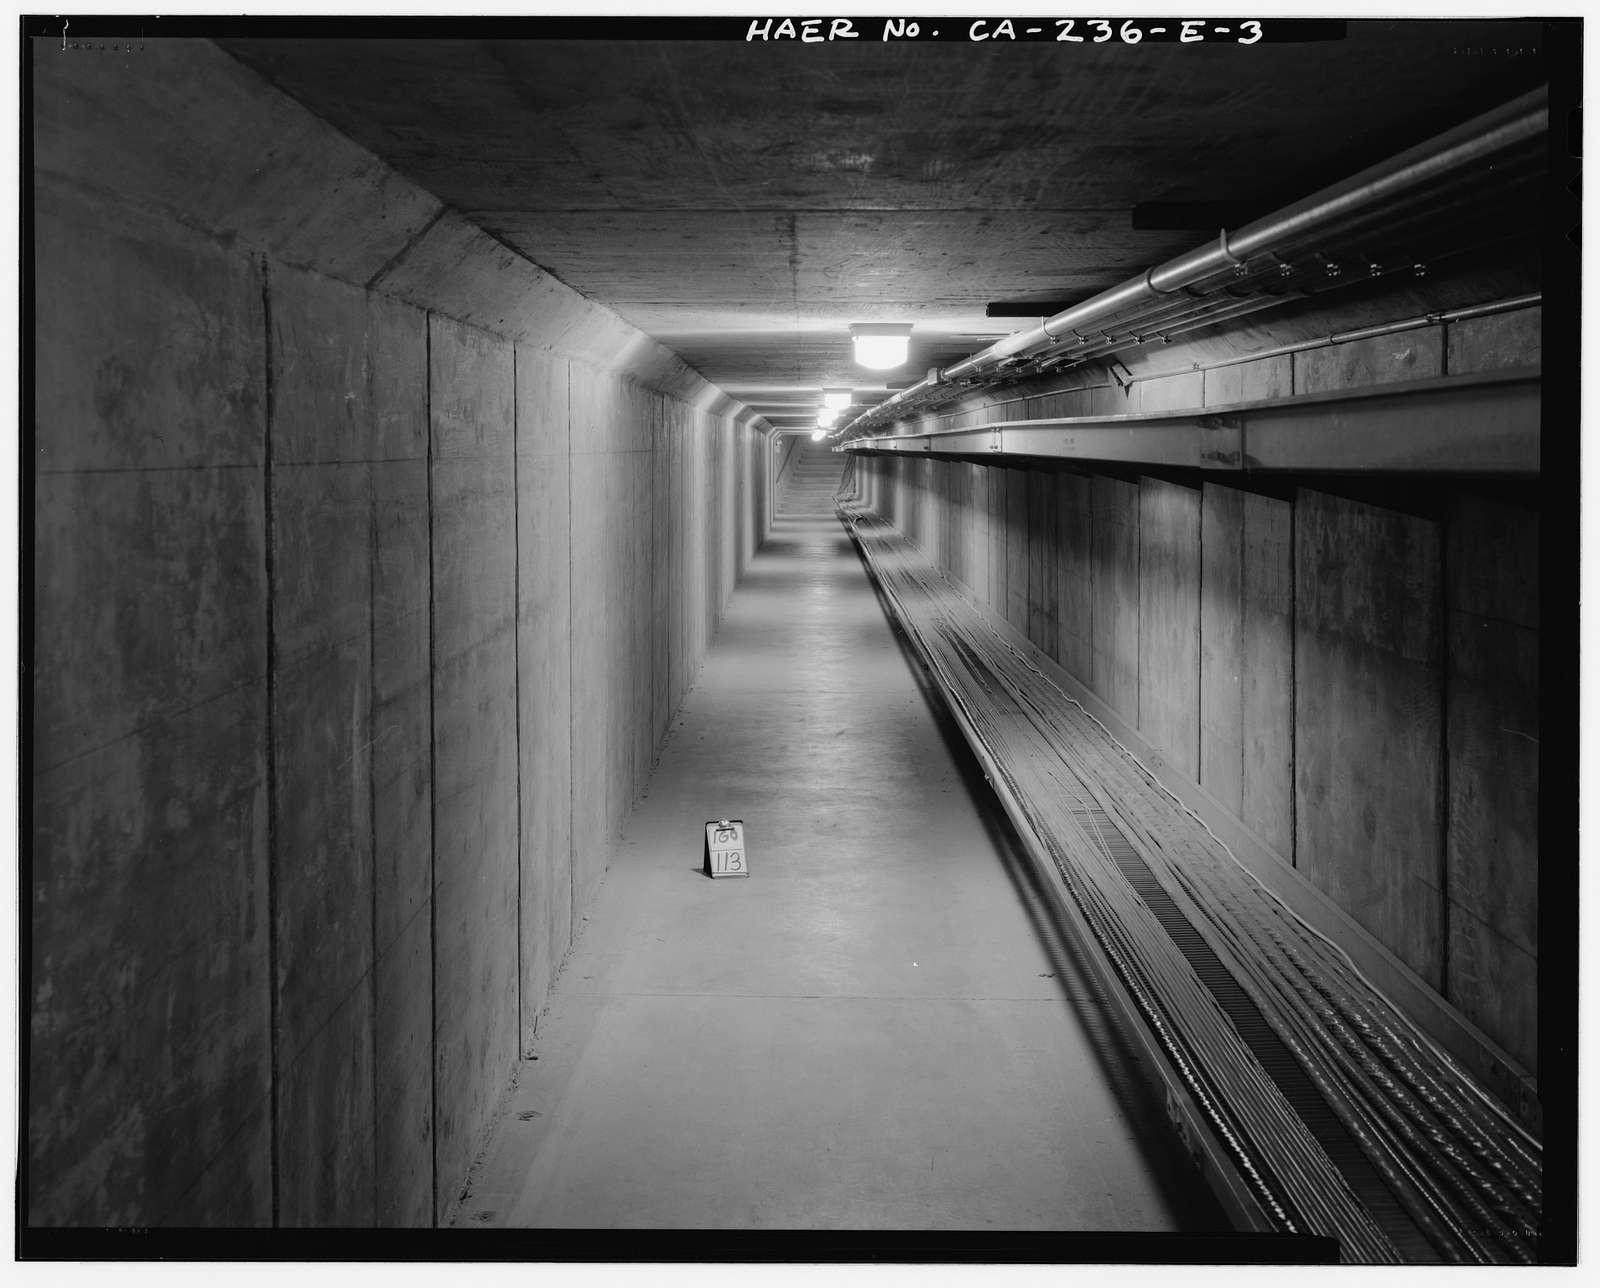 Edwards Air Force Base, Air Force Rocket Propulsion Laboratory, Control Center, Test Area 1-115, near Altair & Saturn Boulevards, Boron, Kern County, CA